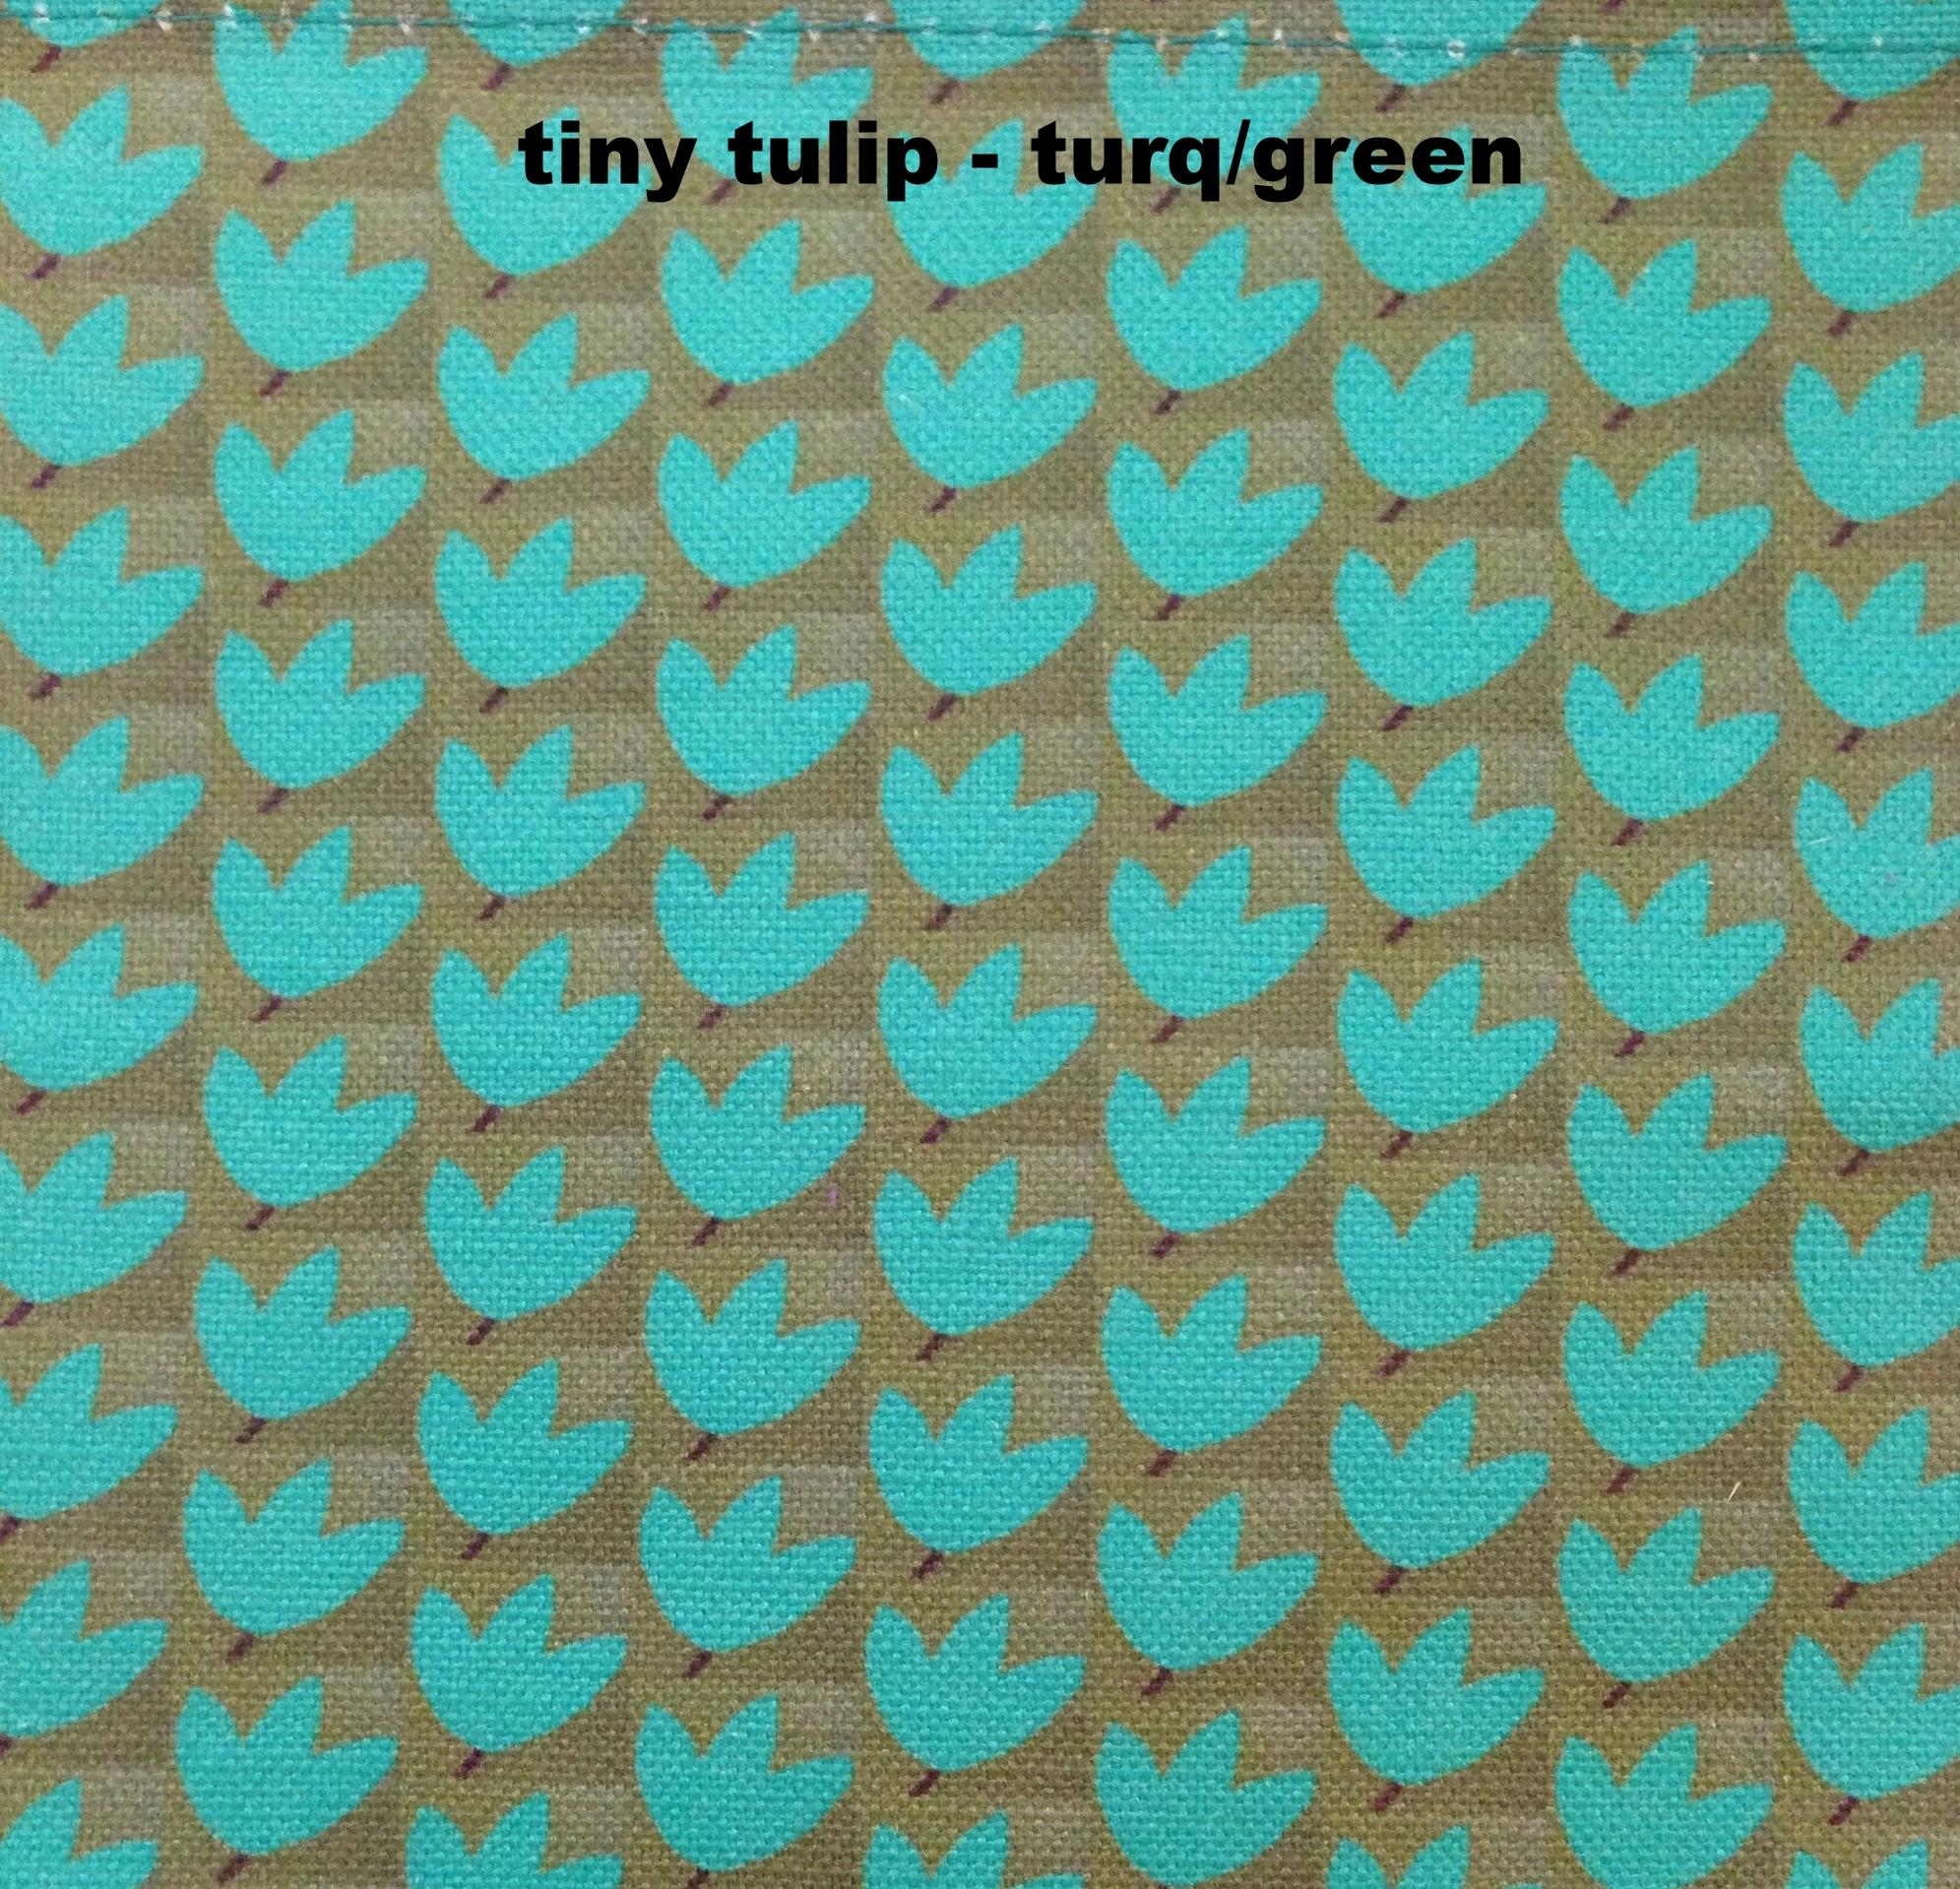 tiny tulip/turq on green